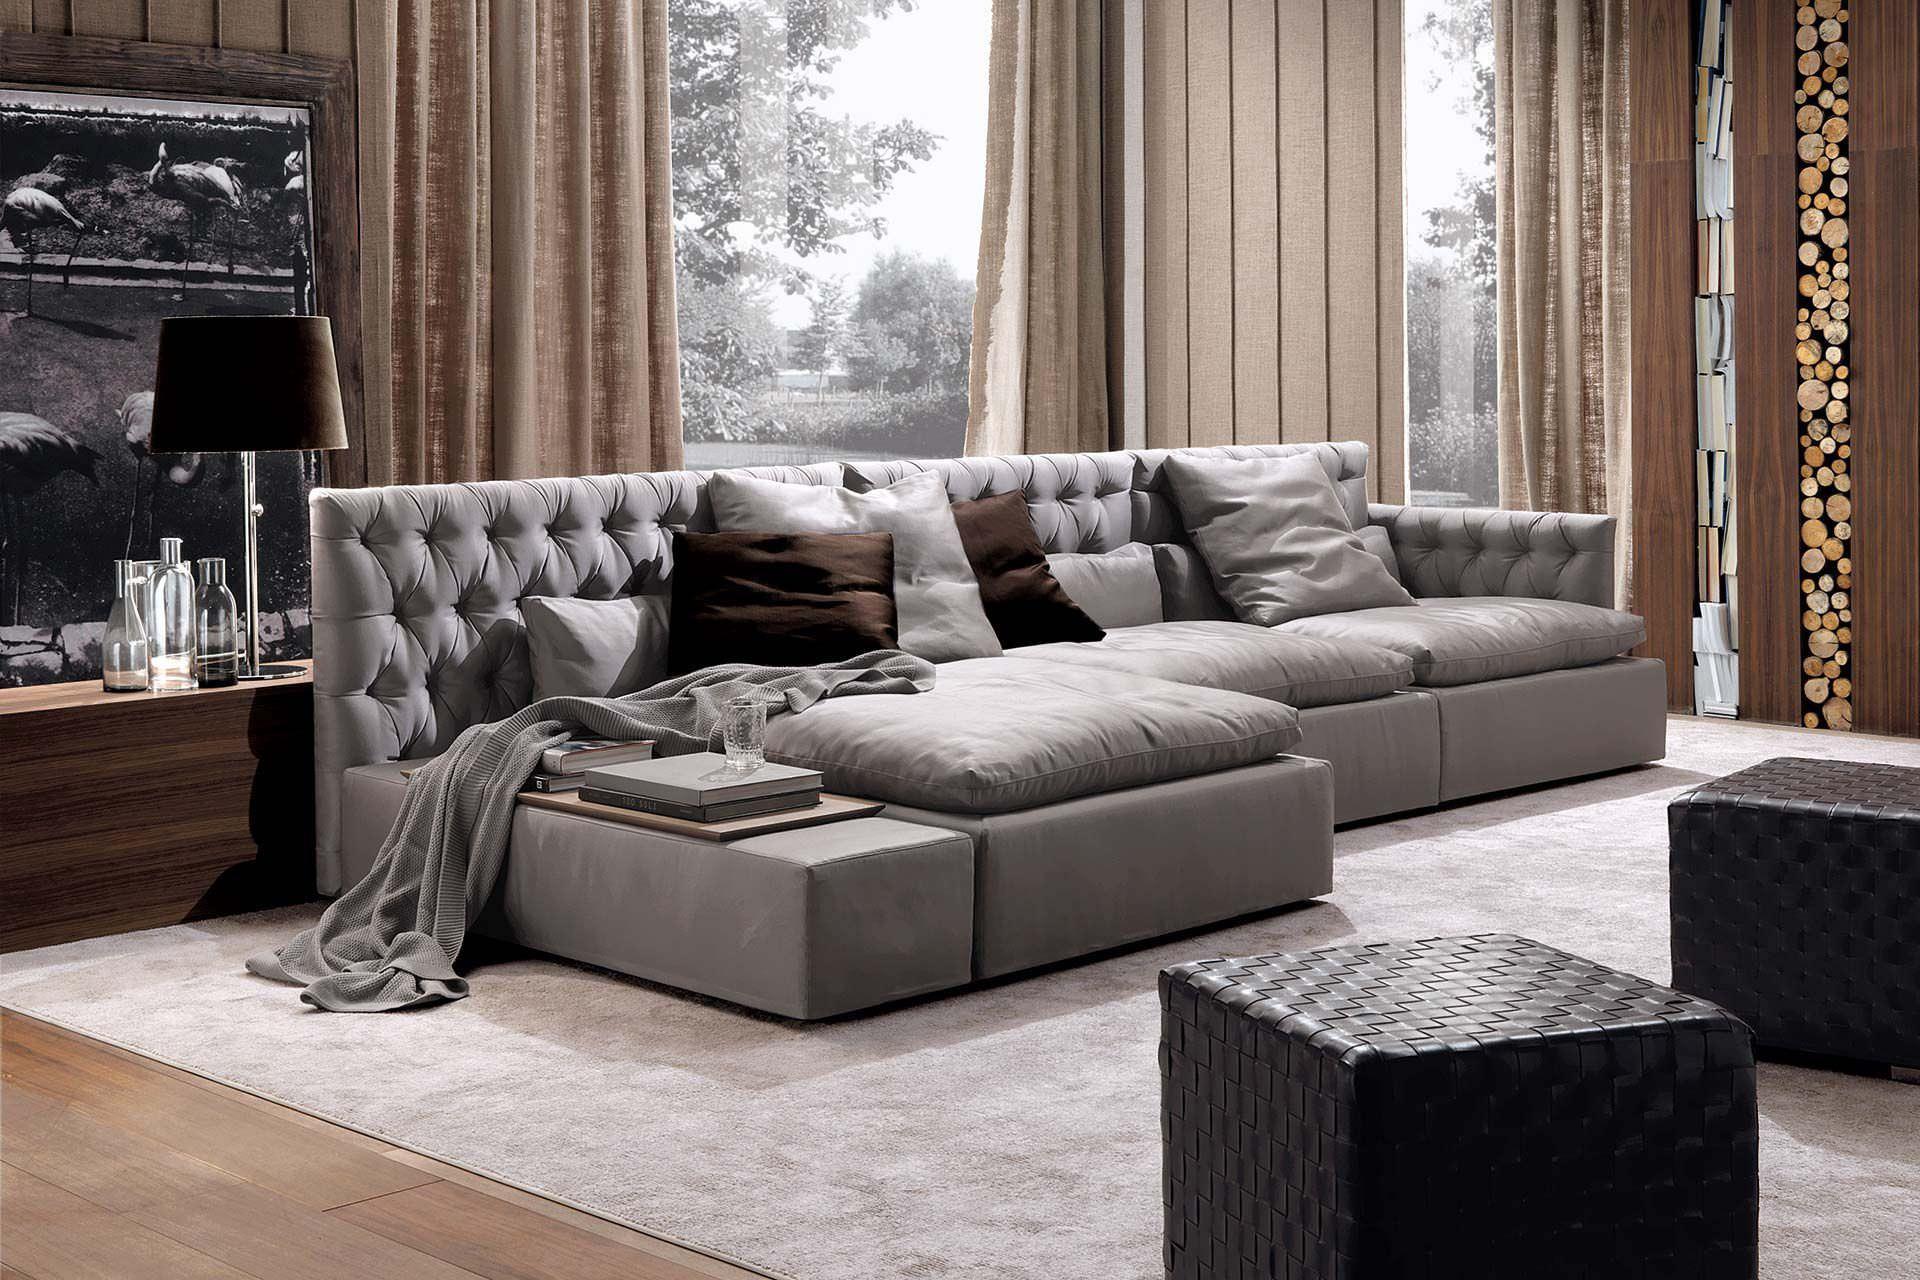 Sofa modern stoff  Modulierbares Sofa / modern / Stoff / Leder - DOMINIO CAPITONNÉ ...